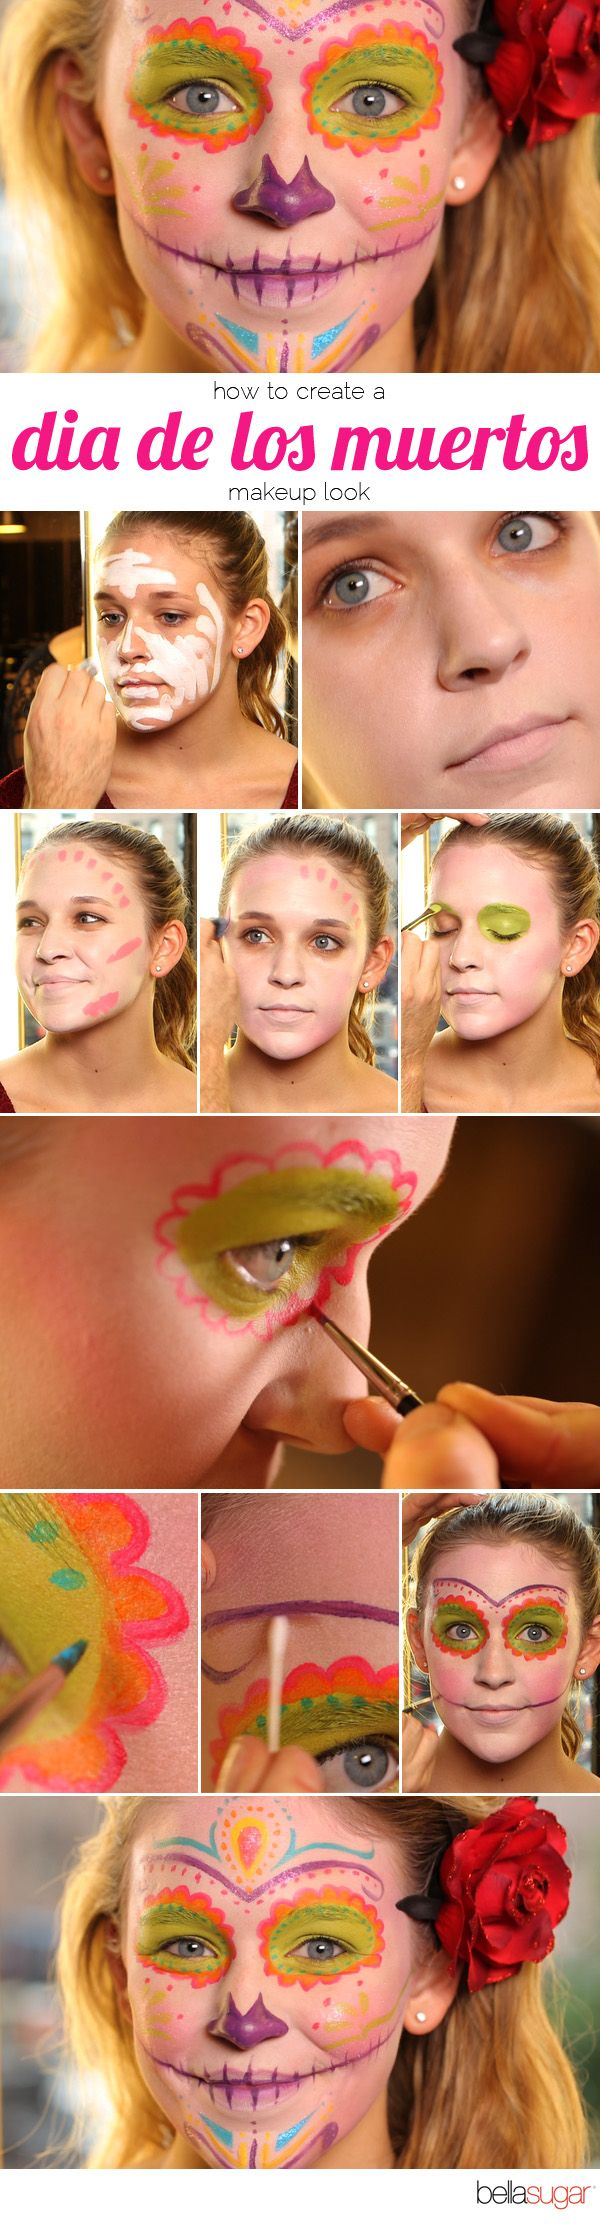 maquillaje calaverita